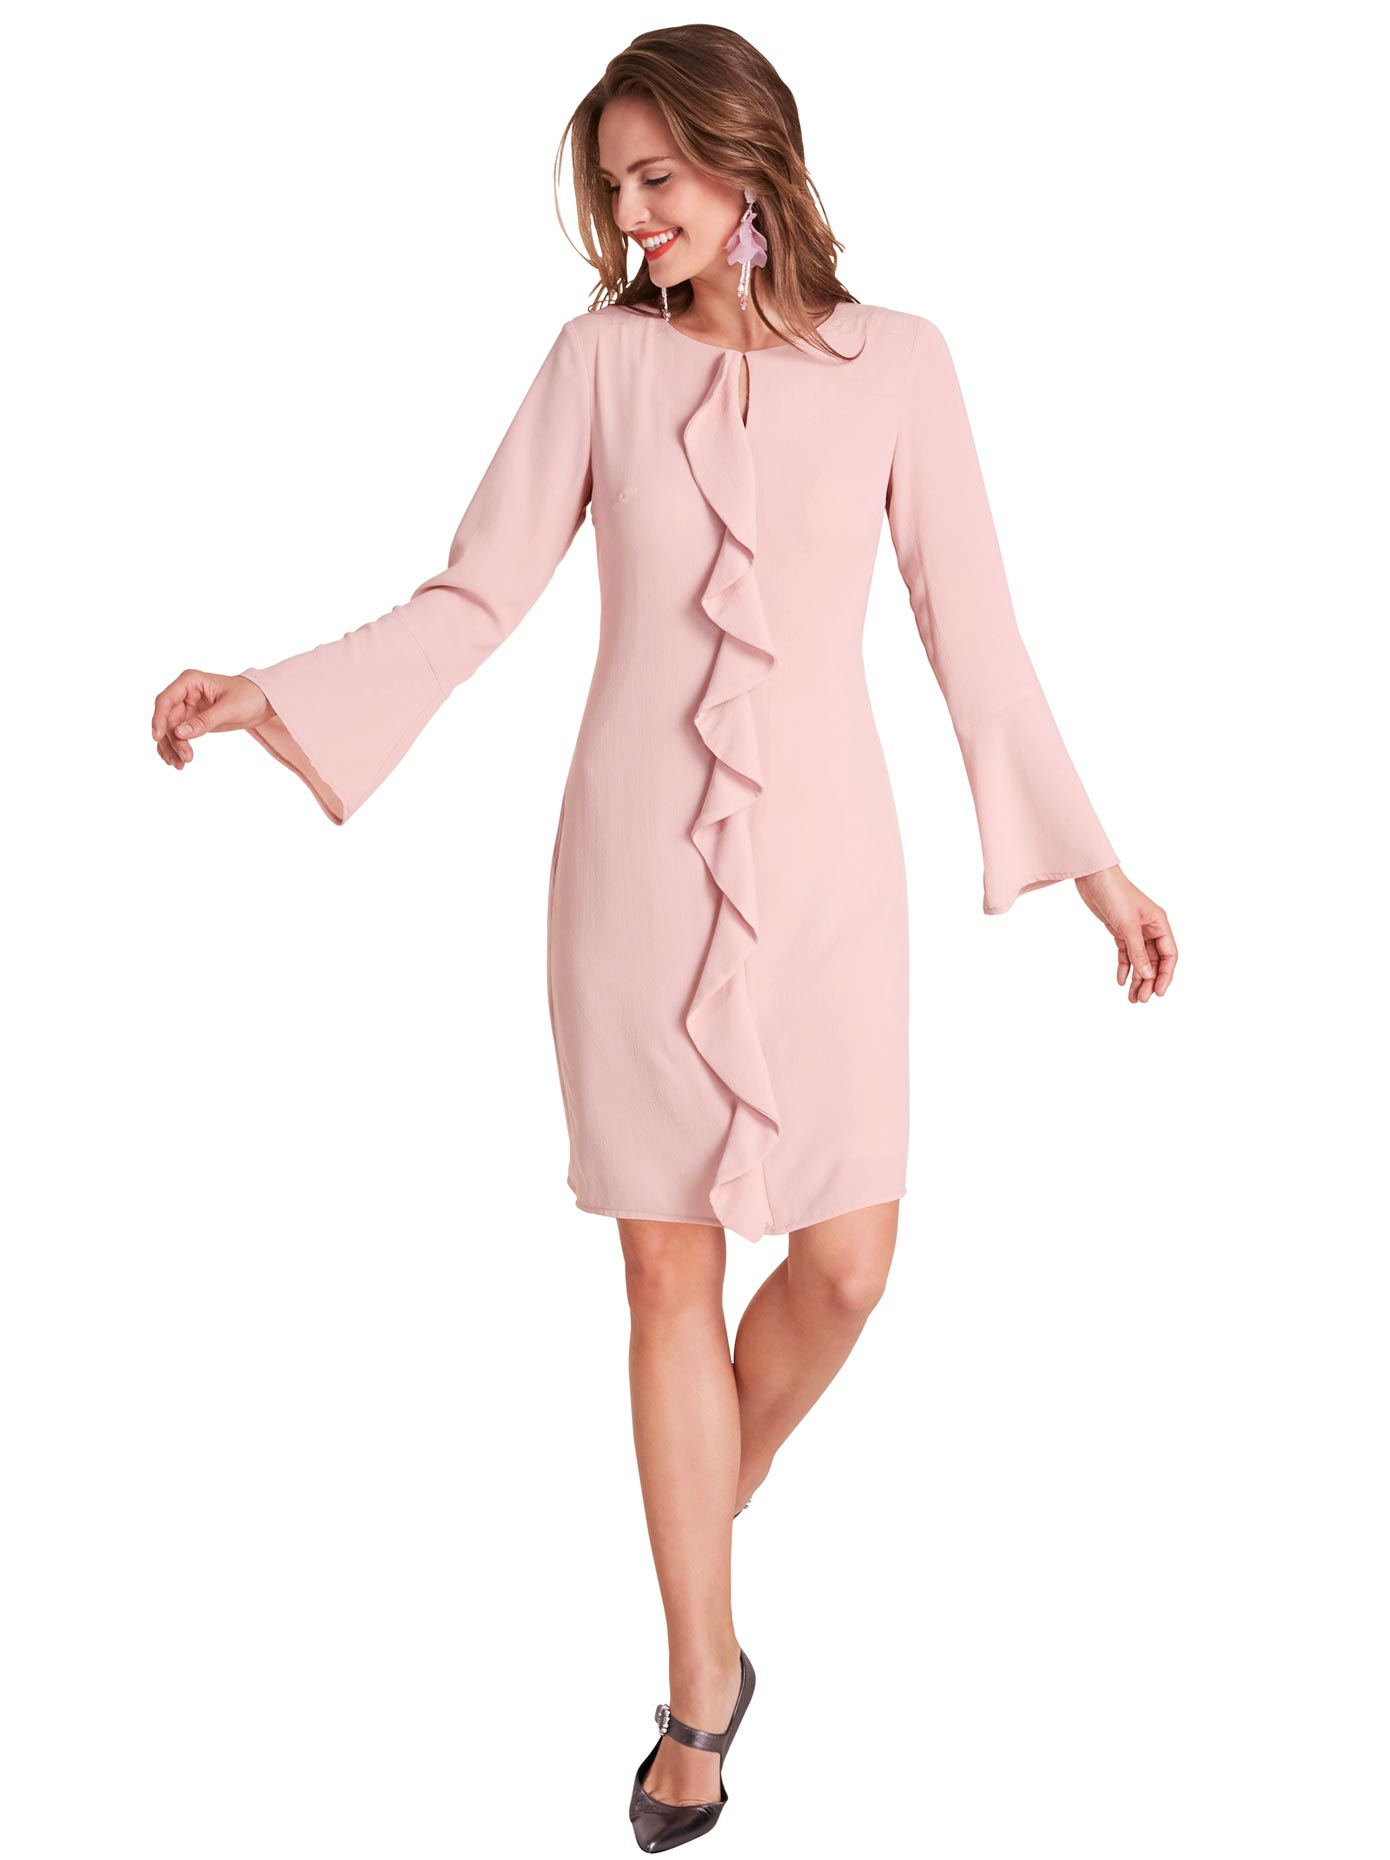 création L Kleid mit charmanter Ausstrahlung